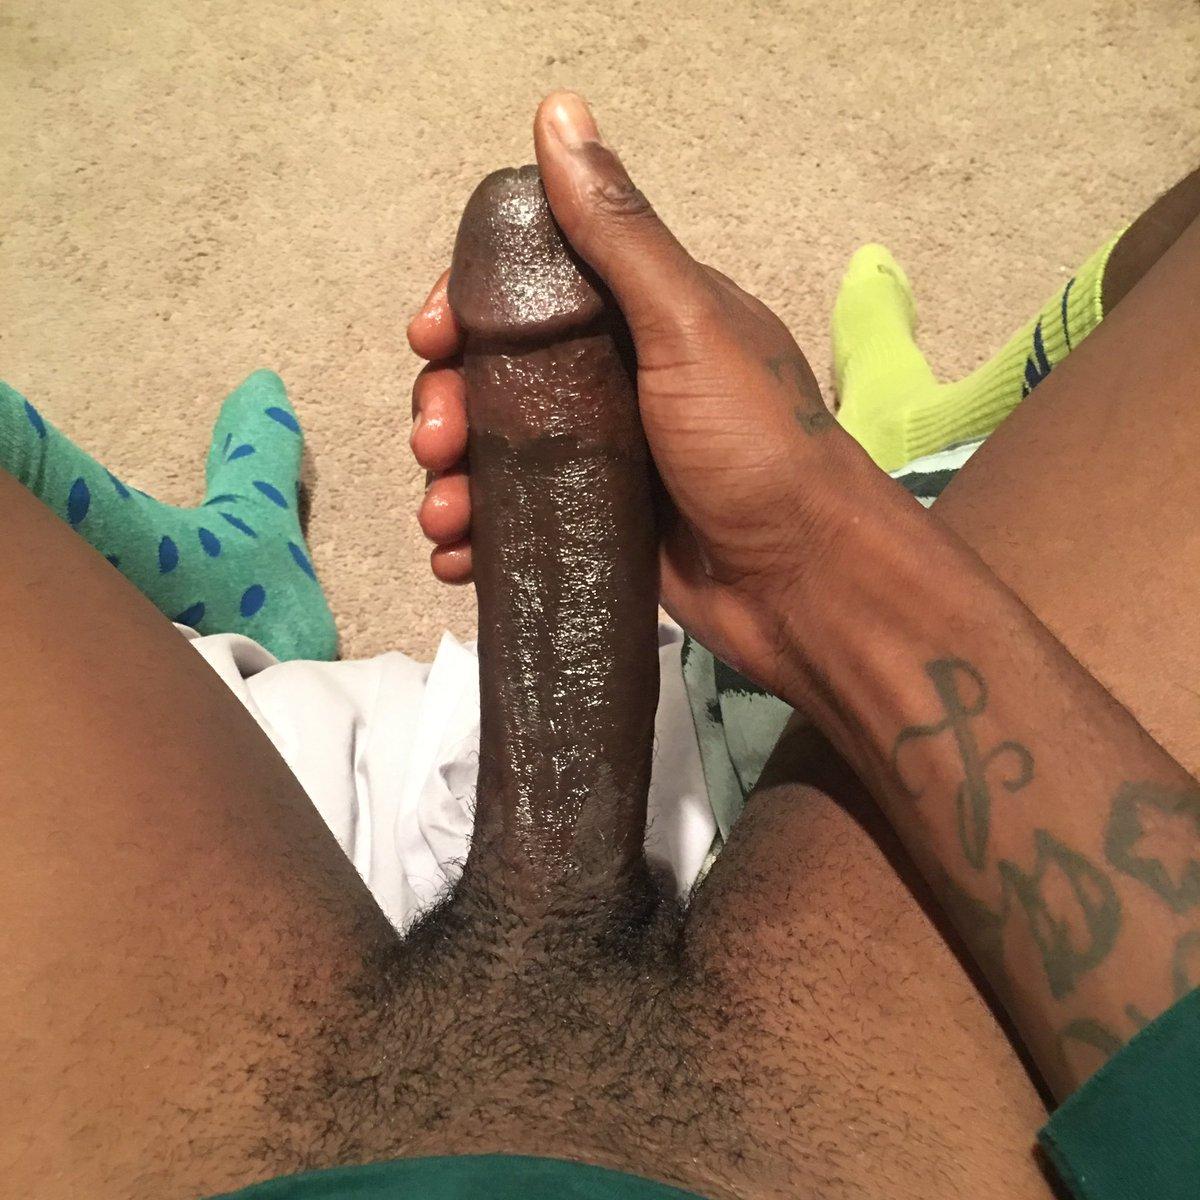 Dicksucking hot milf pics